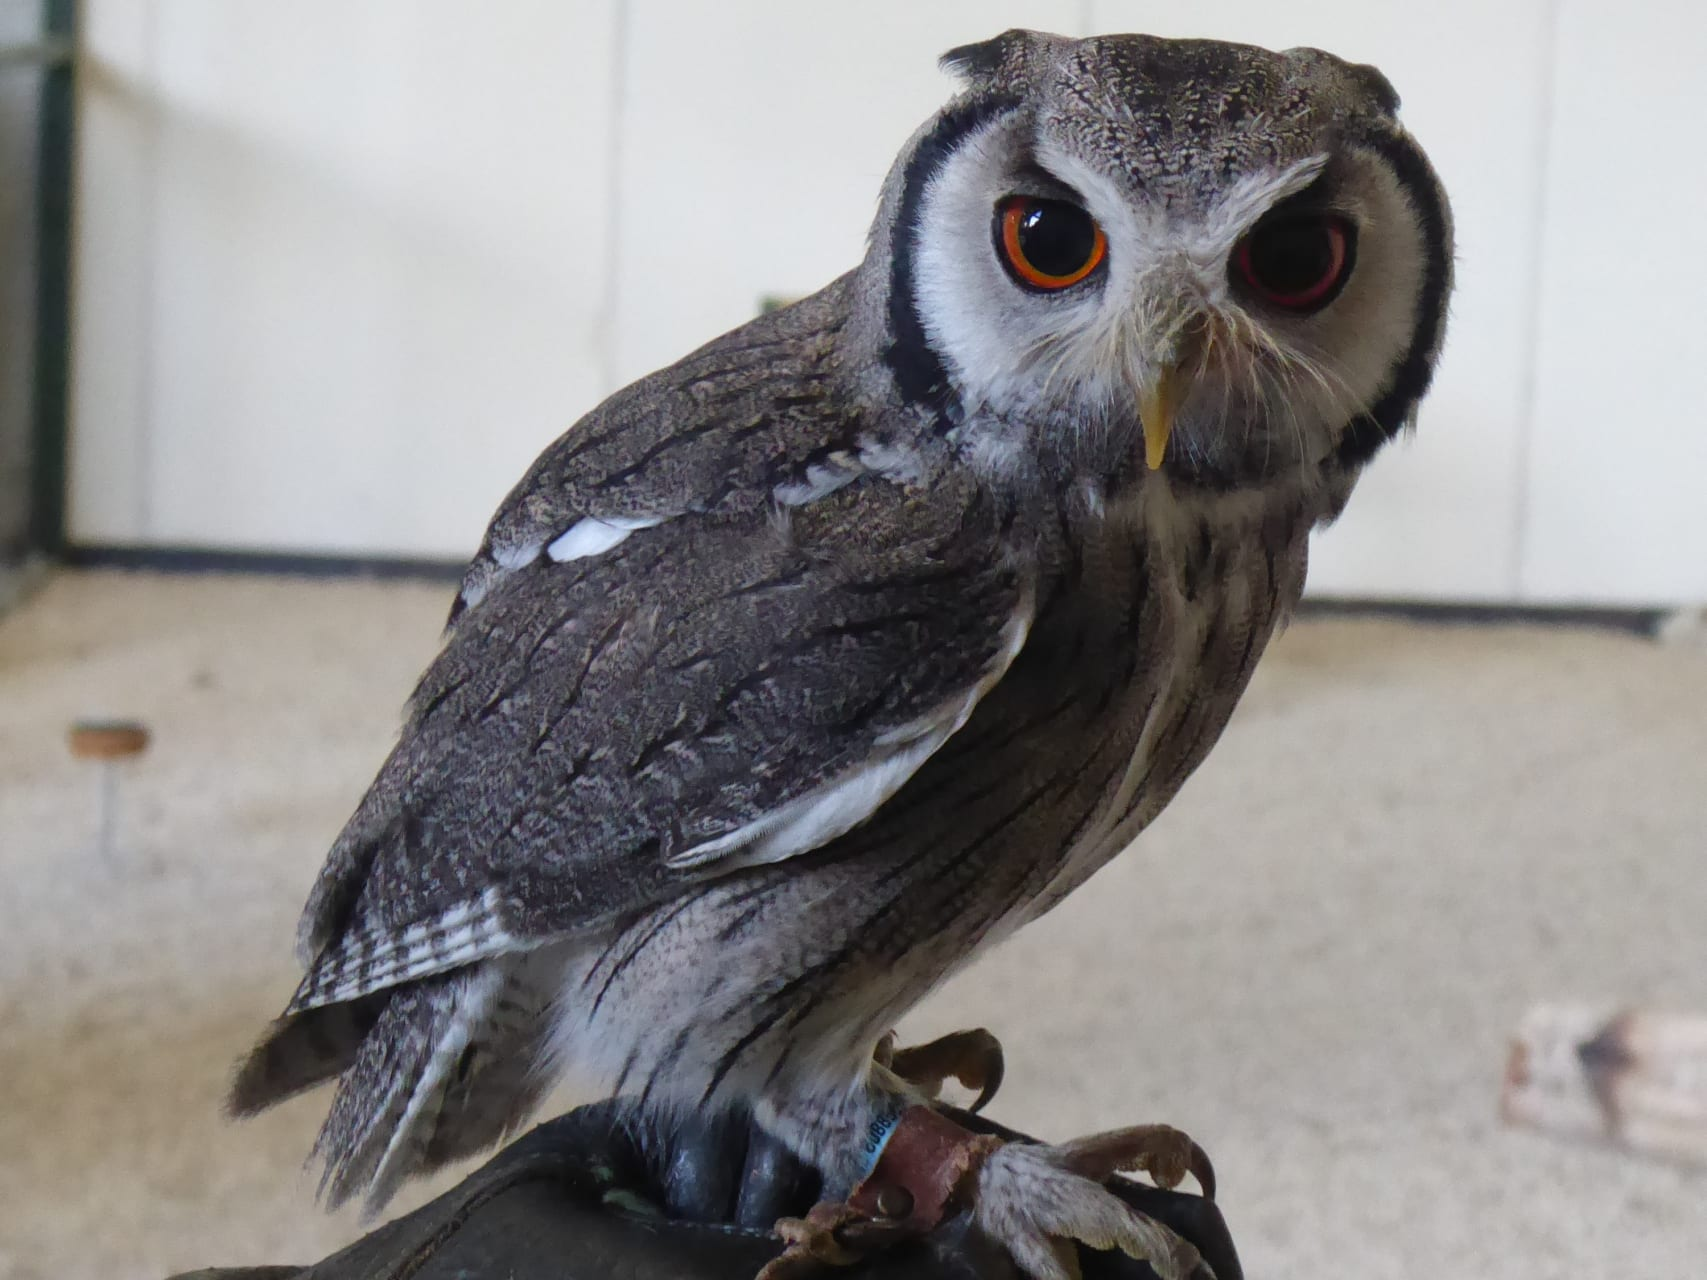 Bath - Bath - Visit a Falconry for a Unique Owl Experience